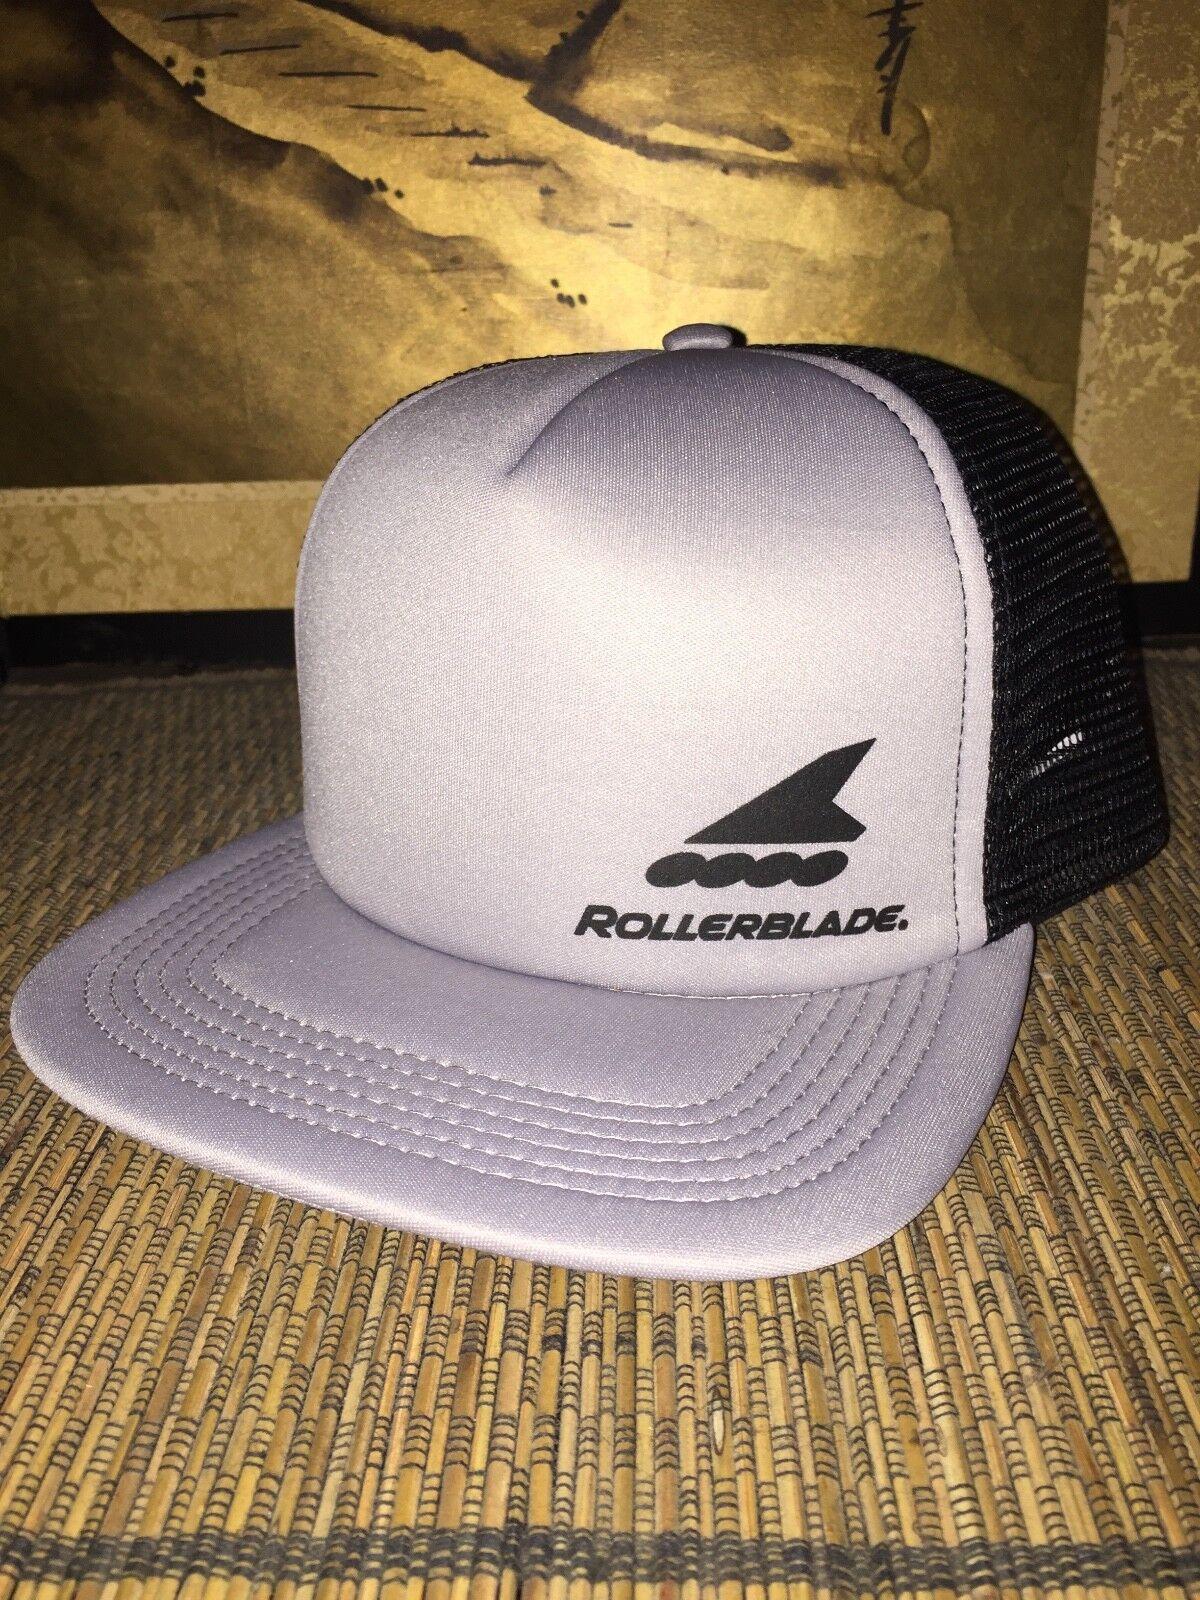 Rollerblade brand Inline skating Trucker Hat- Adjustable One